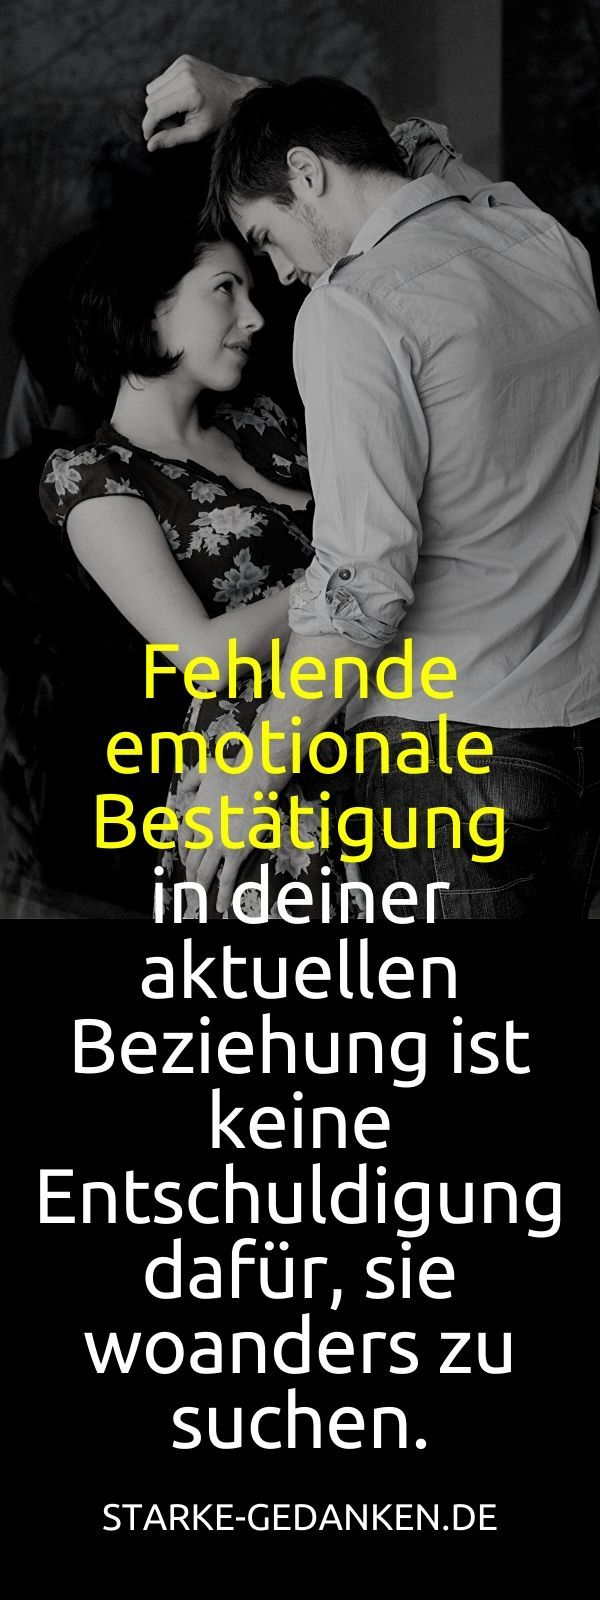 Test emotionale affäre Was ist